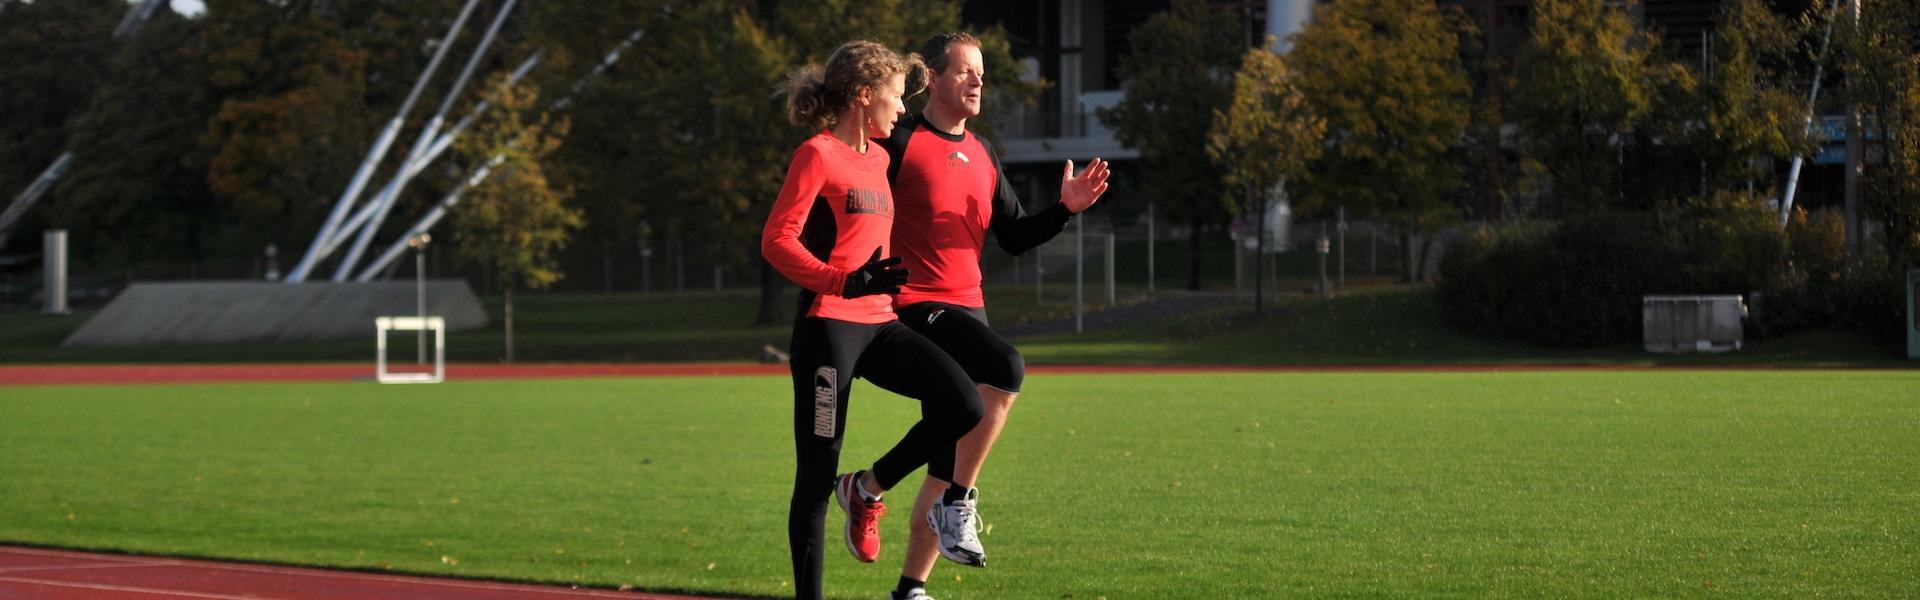 Personal Training mit Fokus Lauftechnik